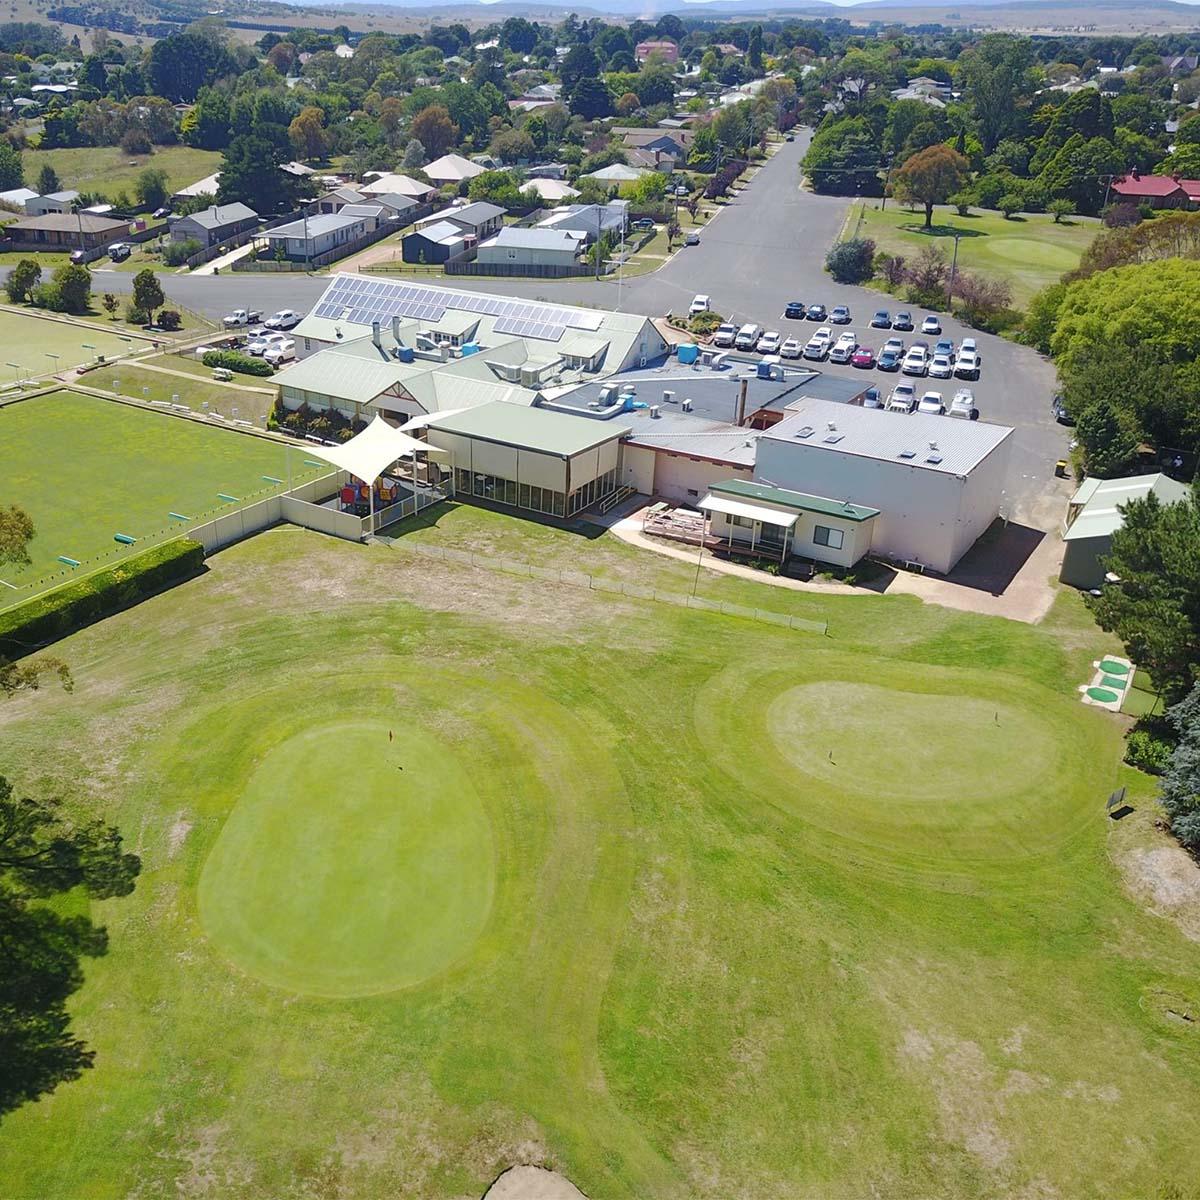 Aerial of the he Braidwood Servicemens Club Golf Course